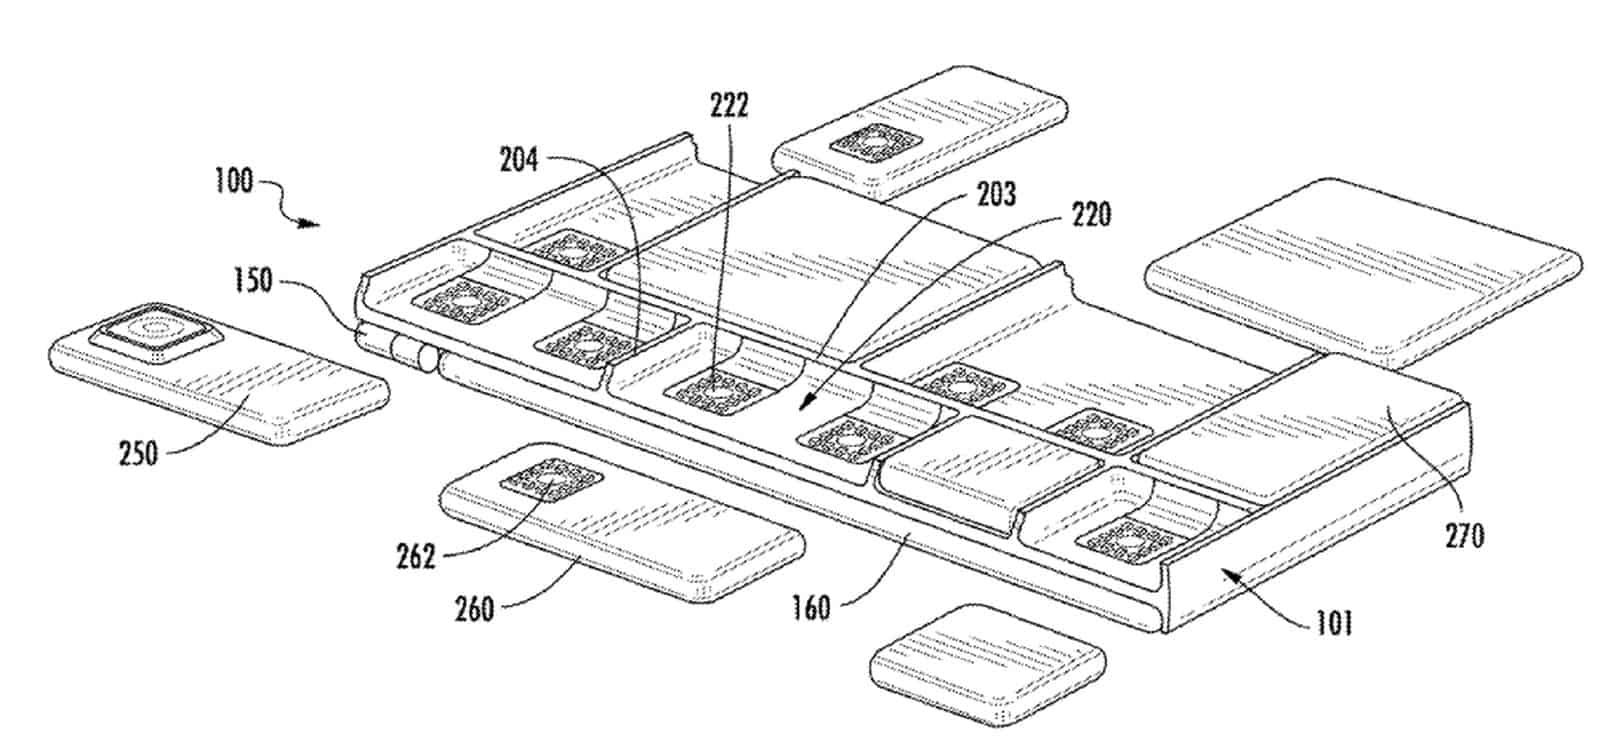 Google modular device patent January 2019 1